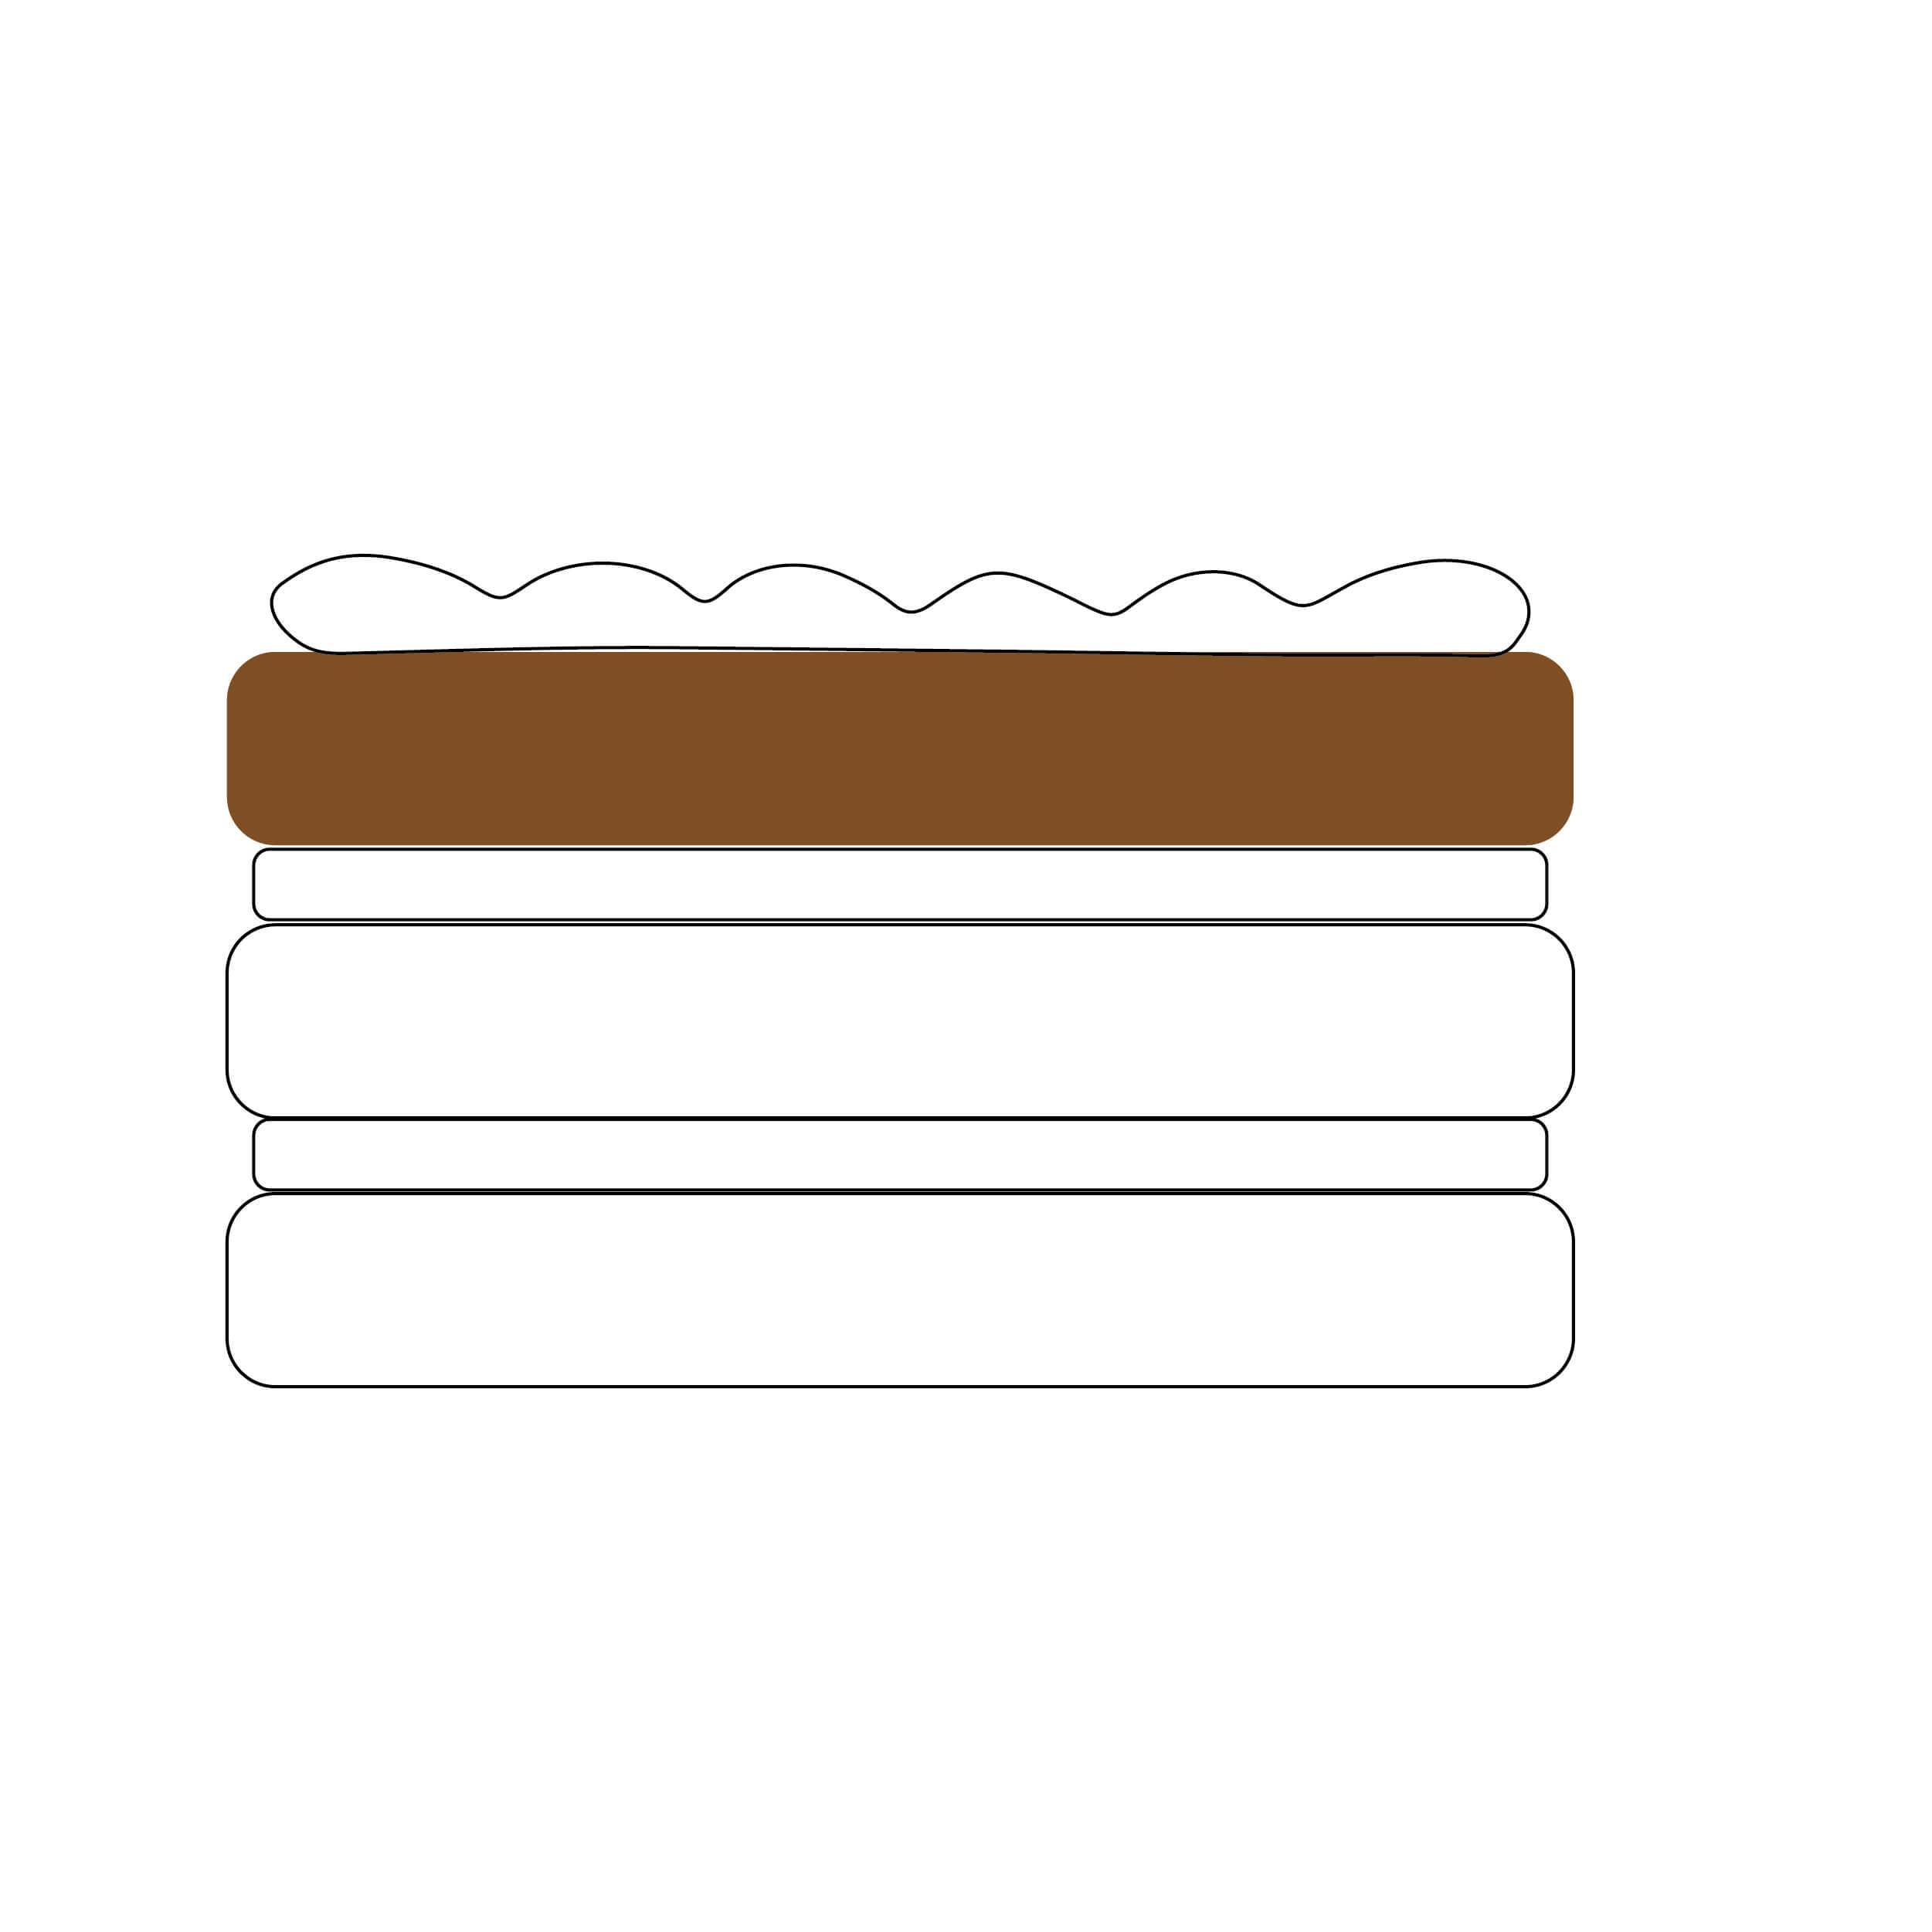 Escolha o bolo de cima :